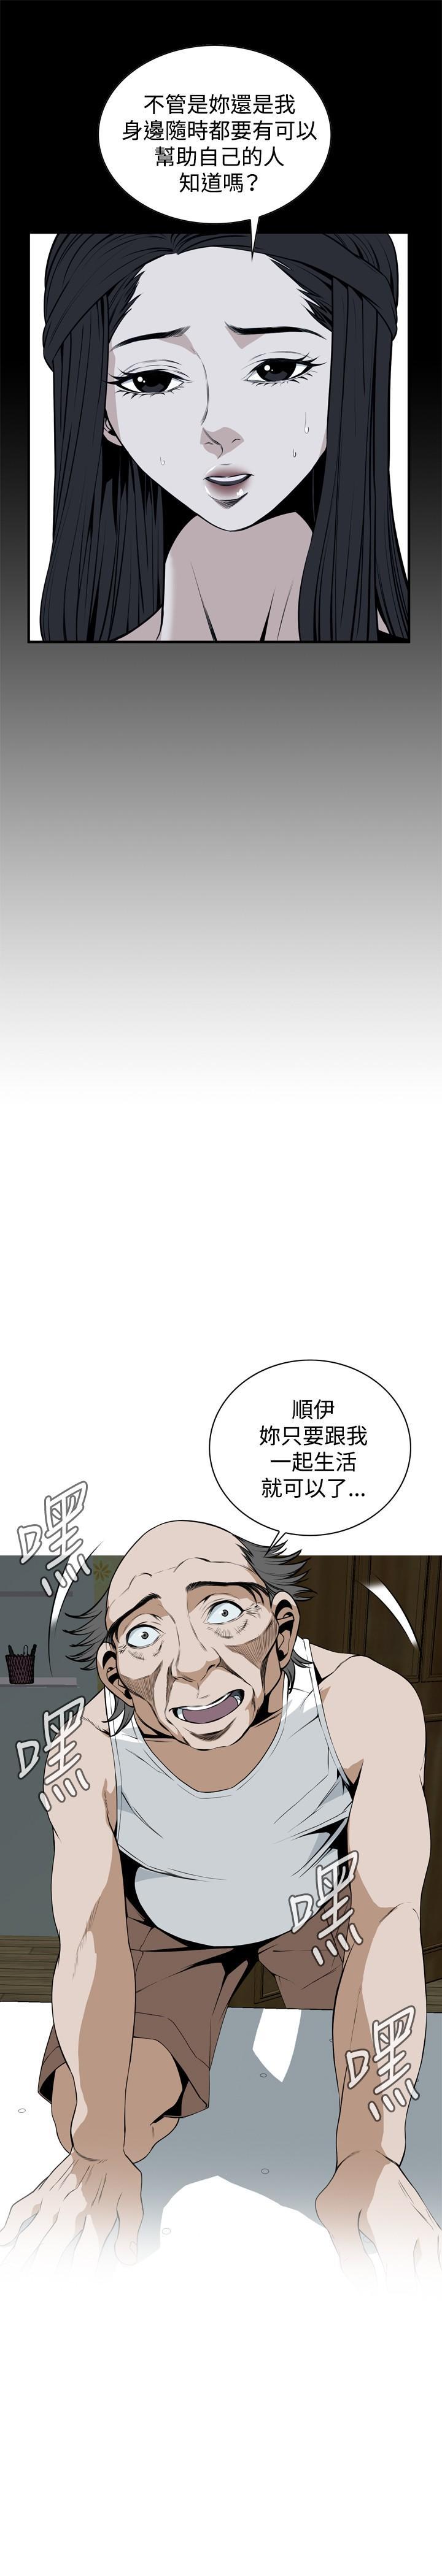 Take a Peek 偷窥 Ch.39~51 [Chinese]中文 7